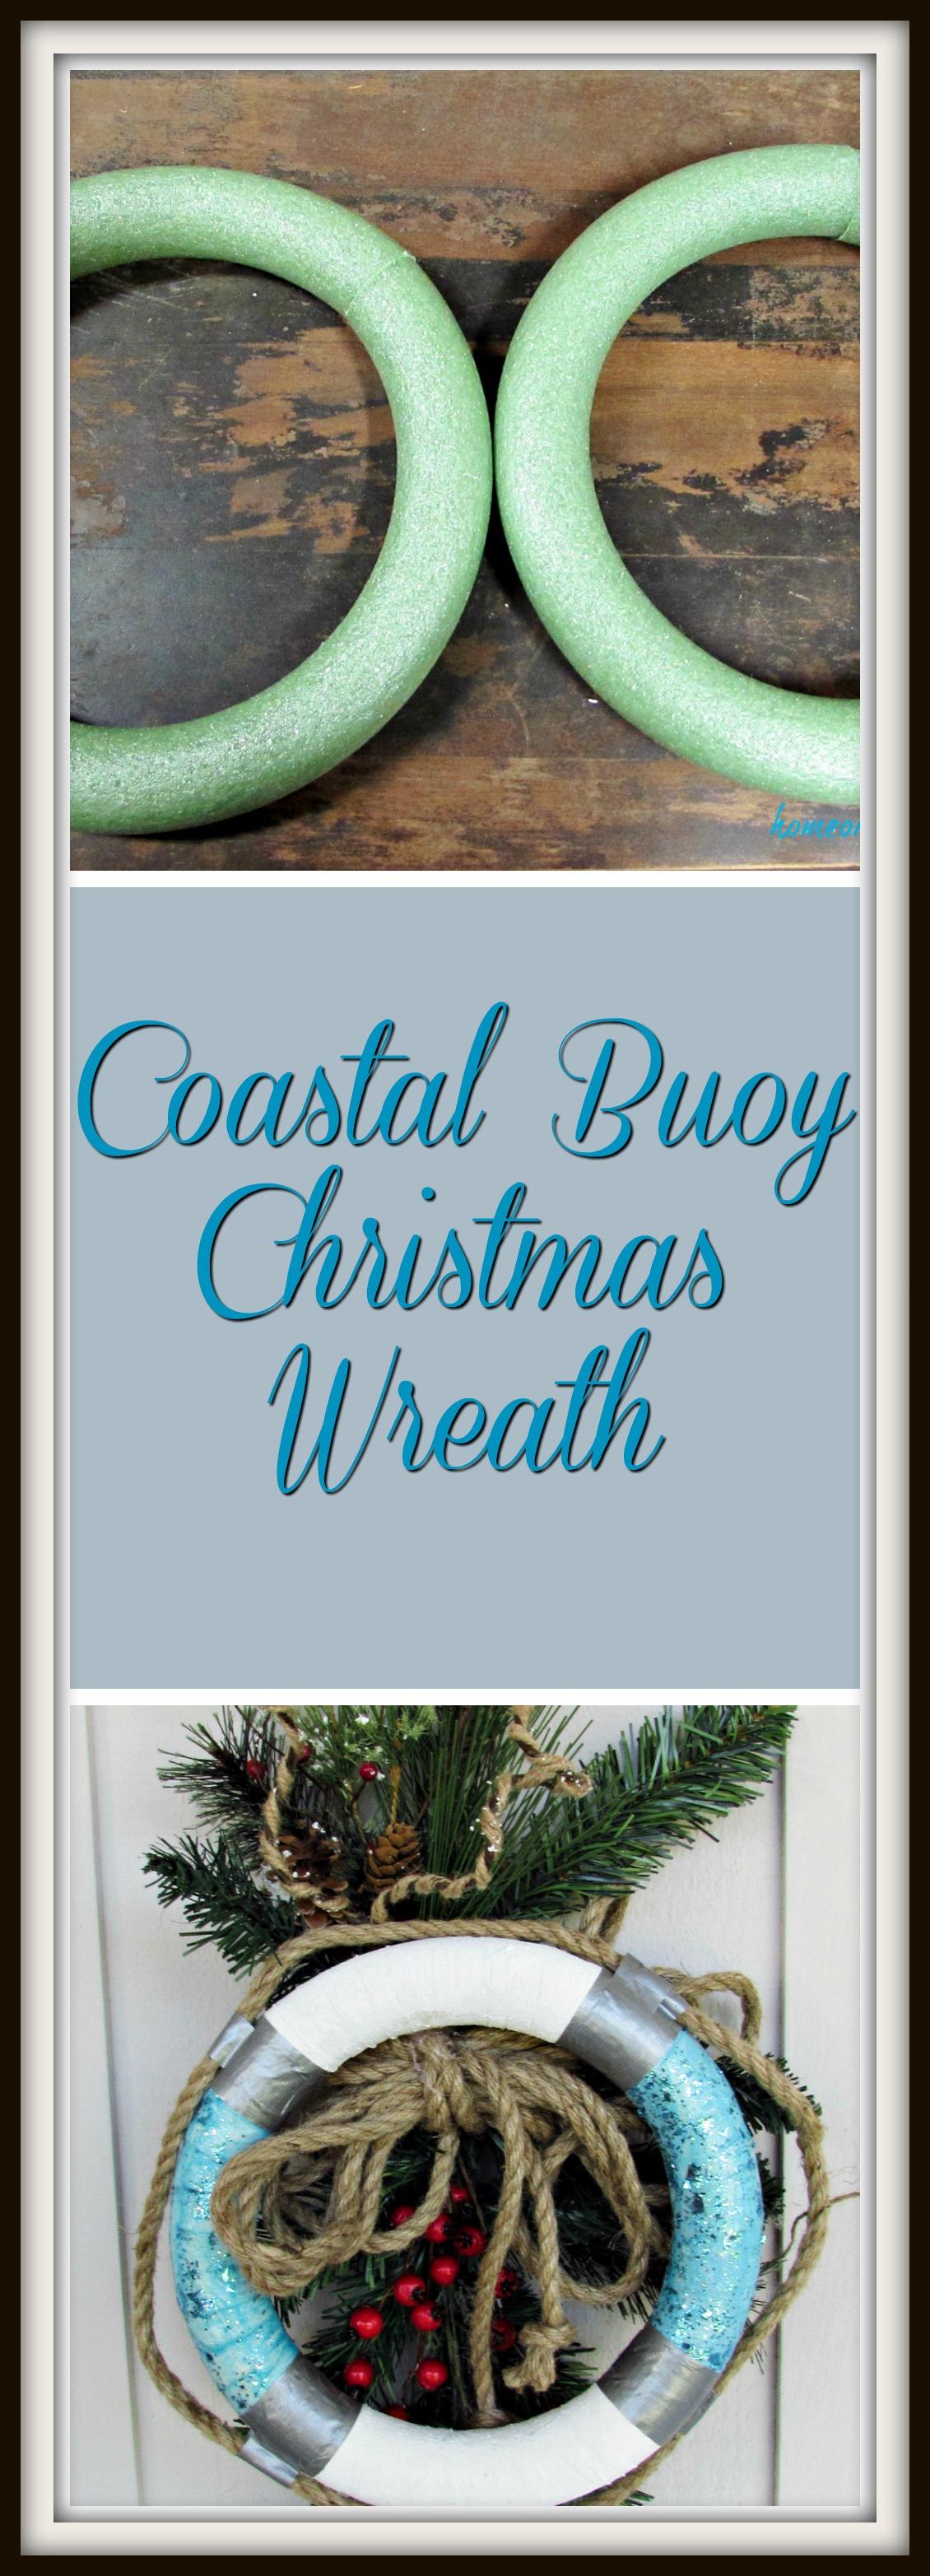 Coastal buoy christmas wreath title